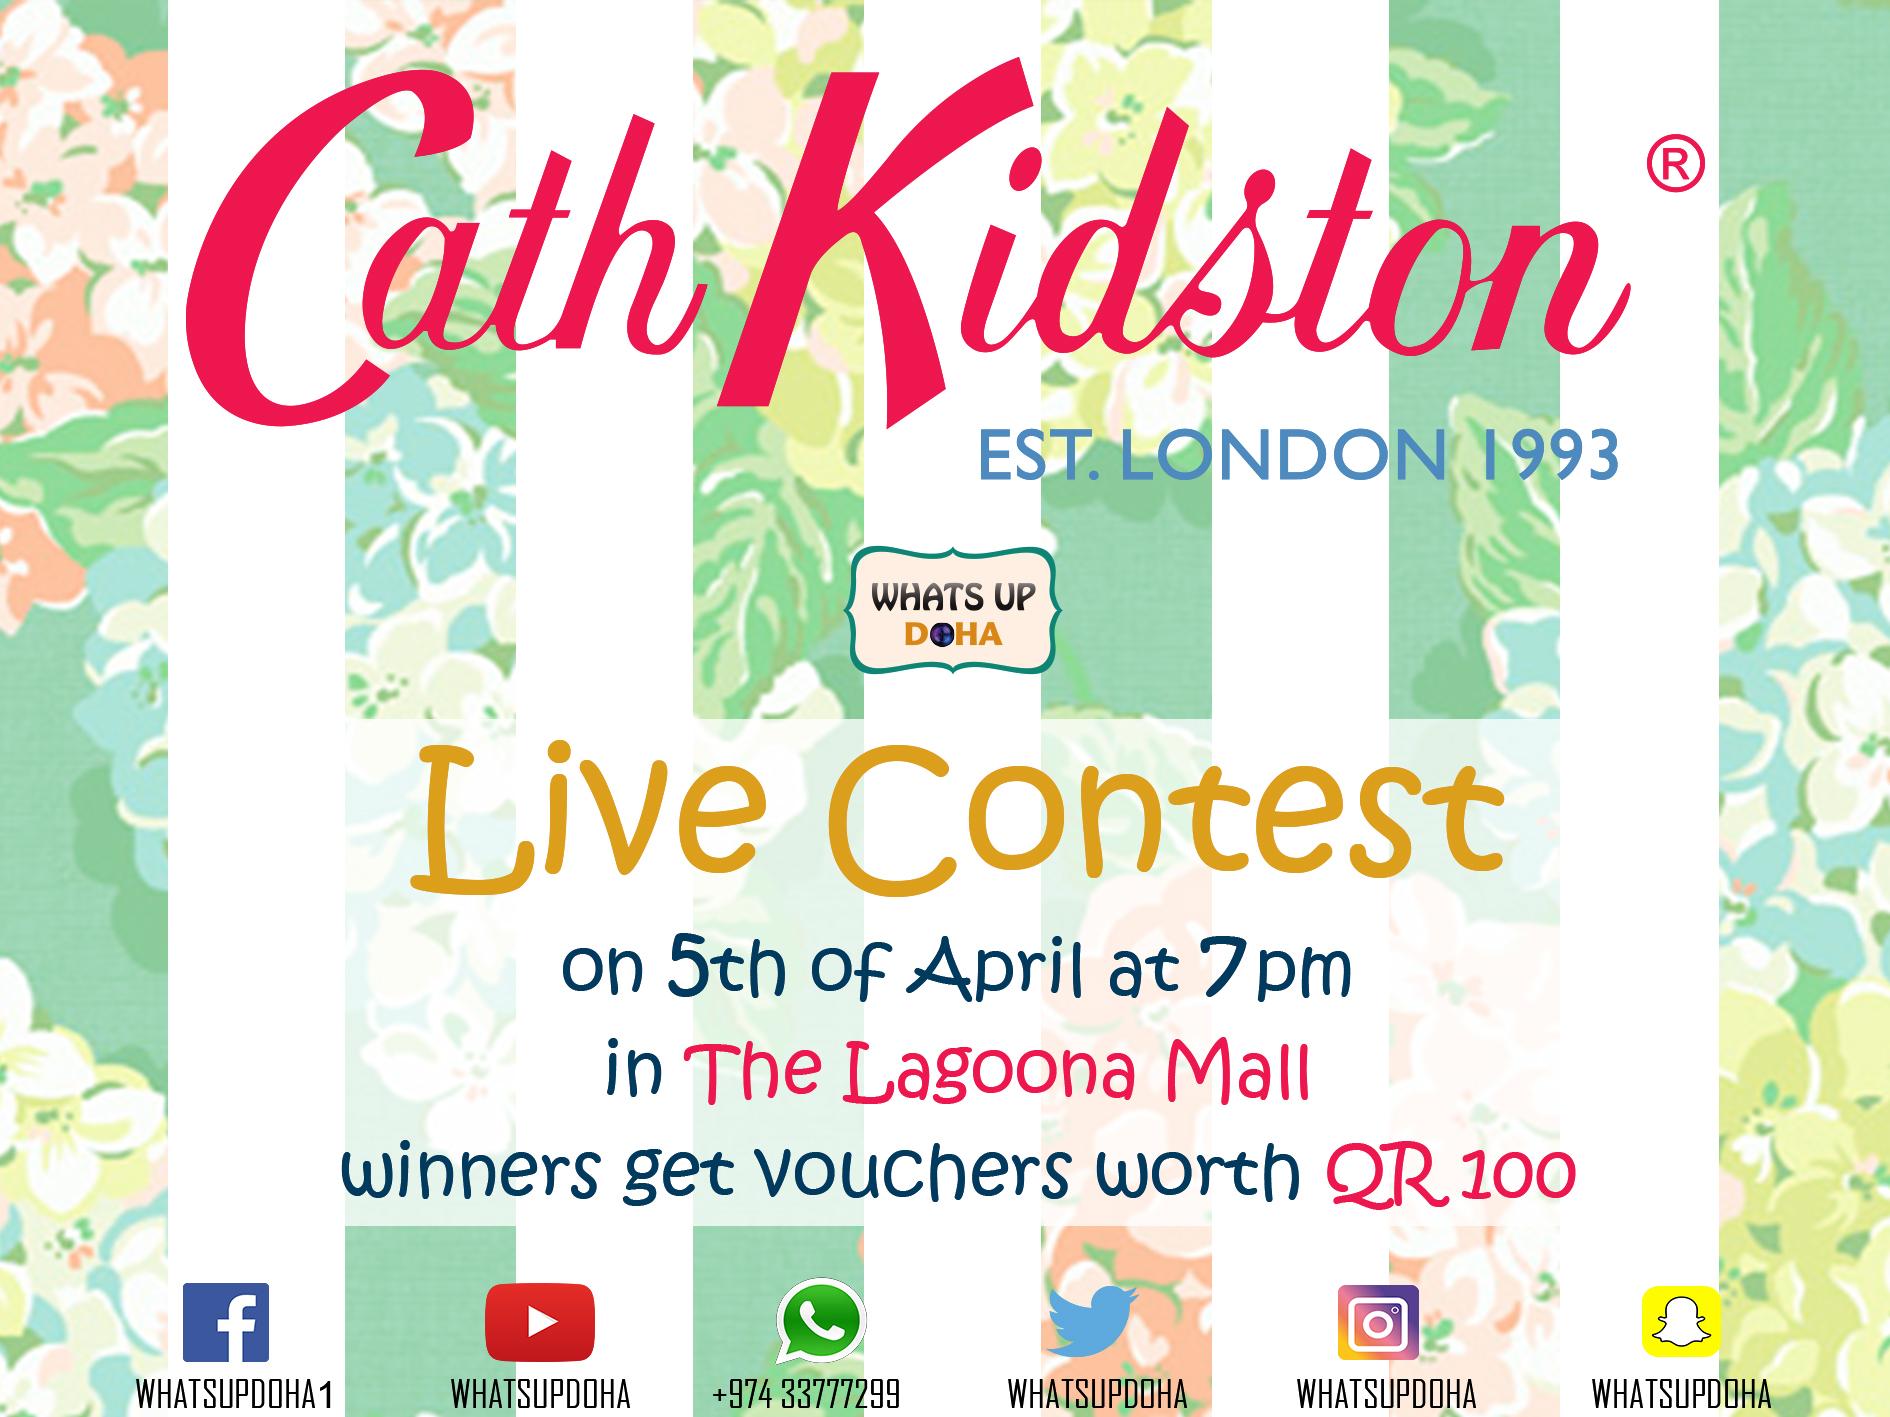 Cath-Kidston-Poster.jpg